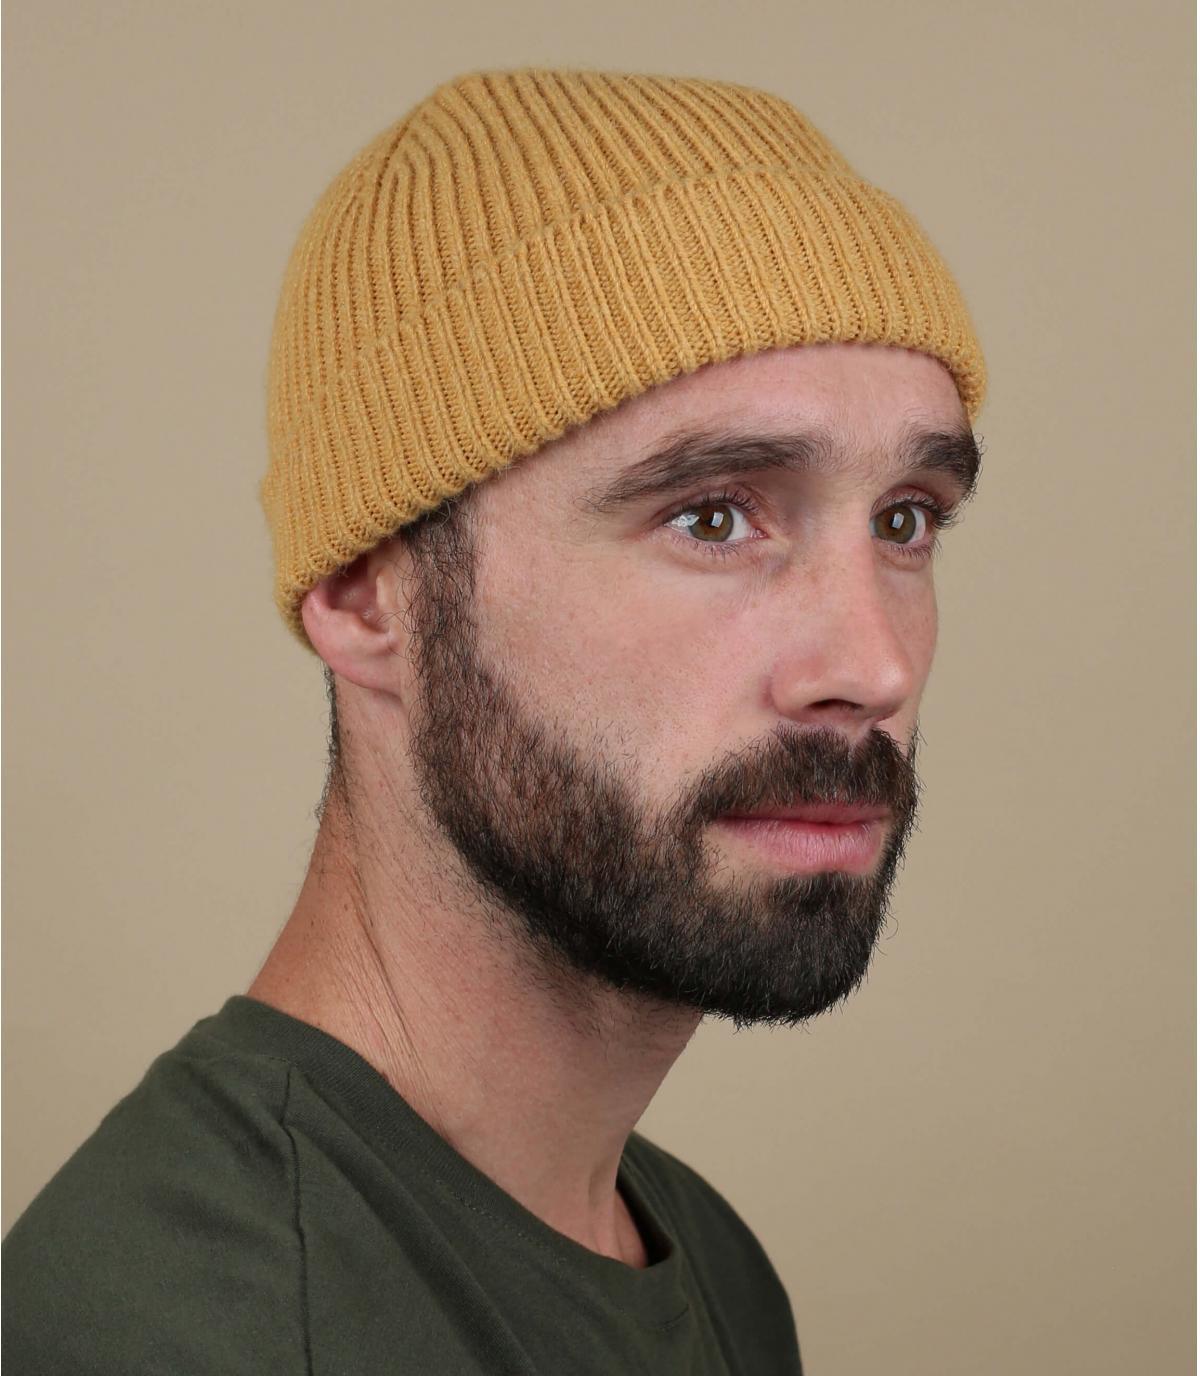 risvolto cappello giallo lana